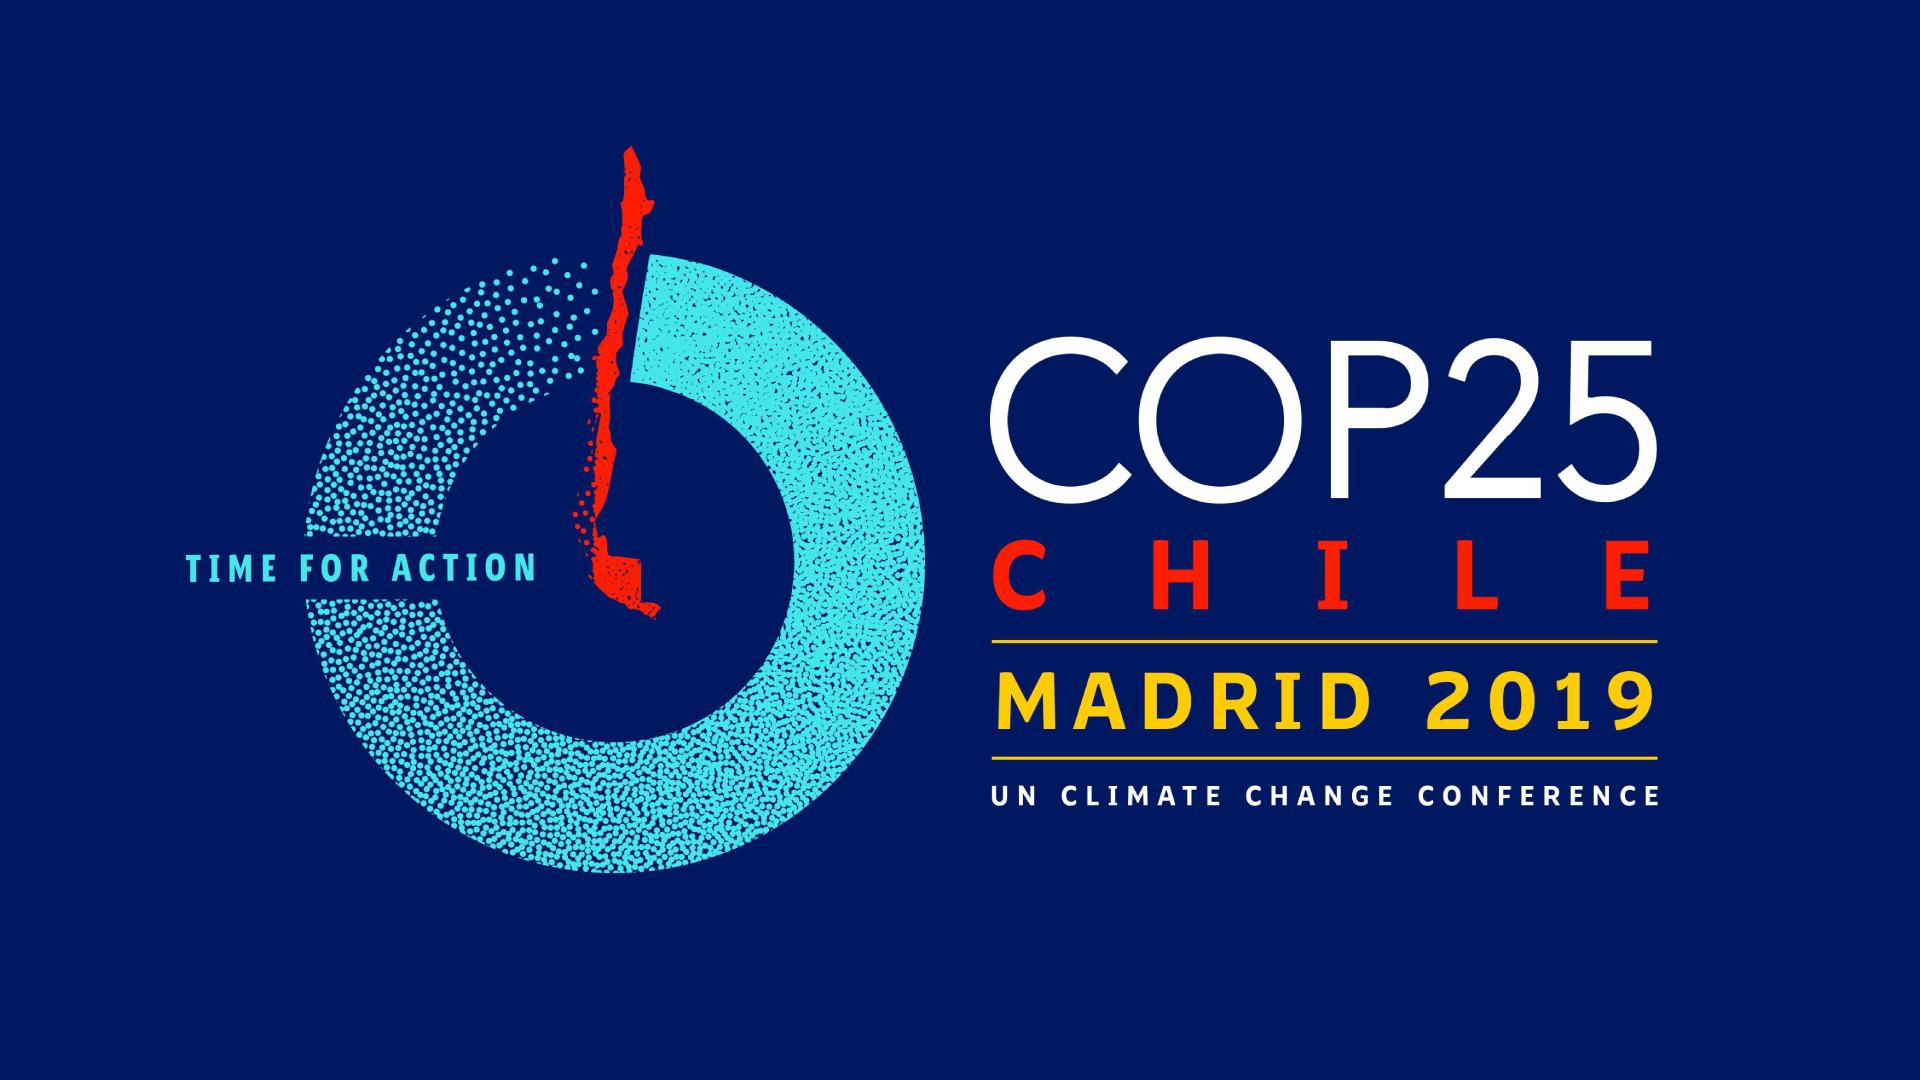 """Tiempo de actuar"", arranca la COP25 en Madrid - ESCI-UPF News"